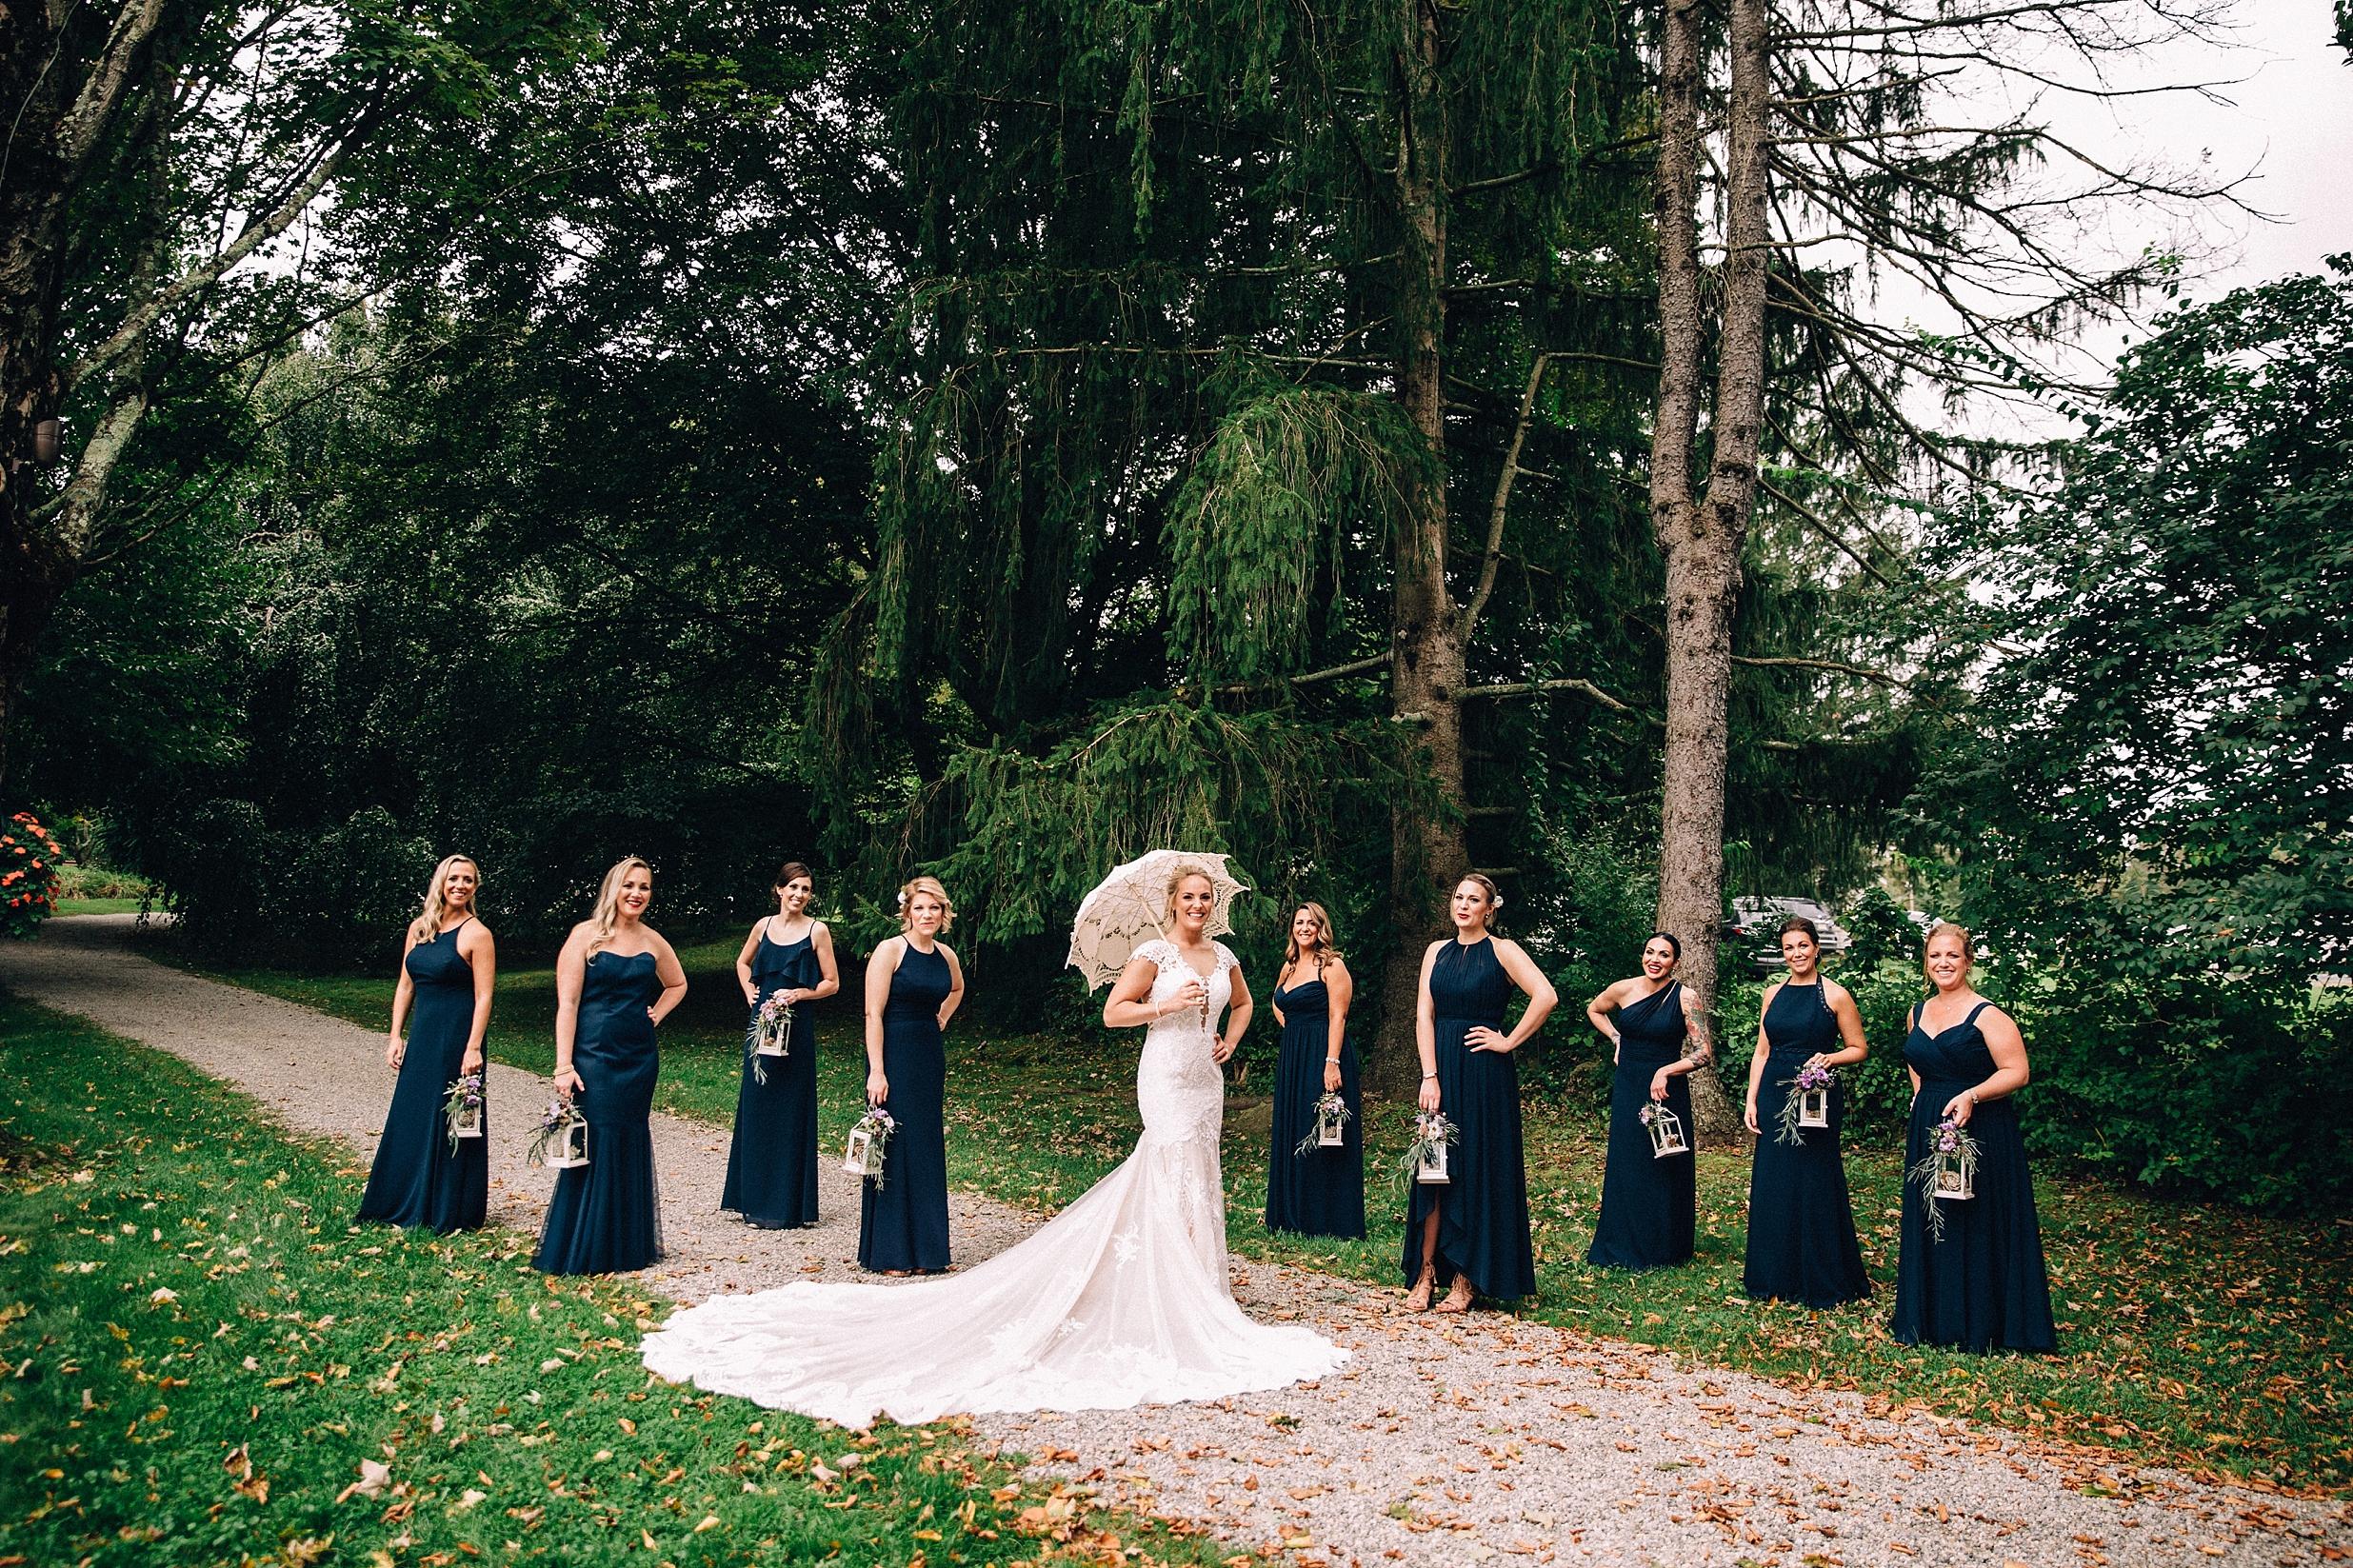 crossed-keys-outdoor-ceremony-camp-wedding-photo_0024.jpg